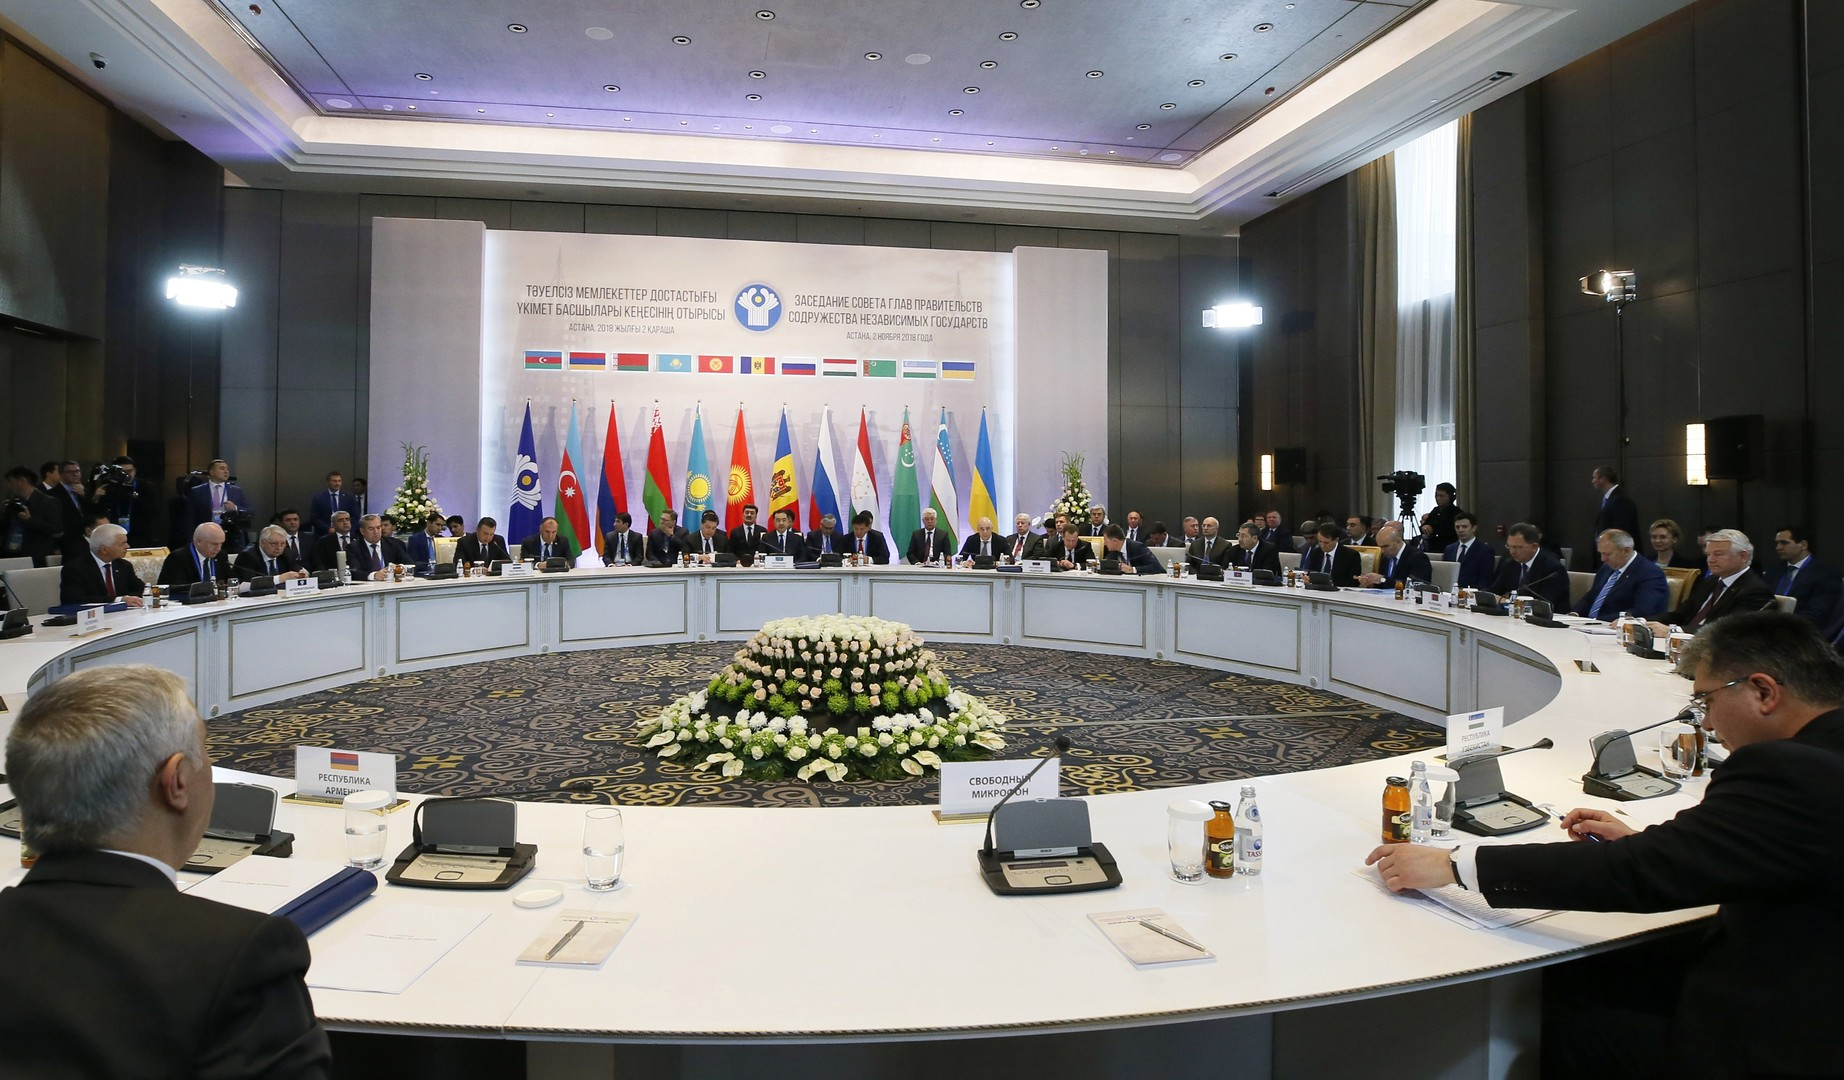 مفاوضات أستانا (نورسلطان)، كازاخستان، 2 نوفمبر 2018